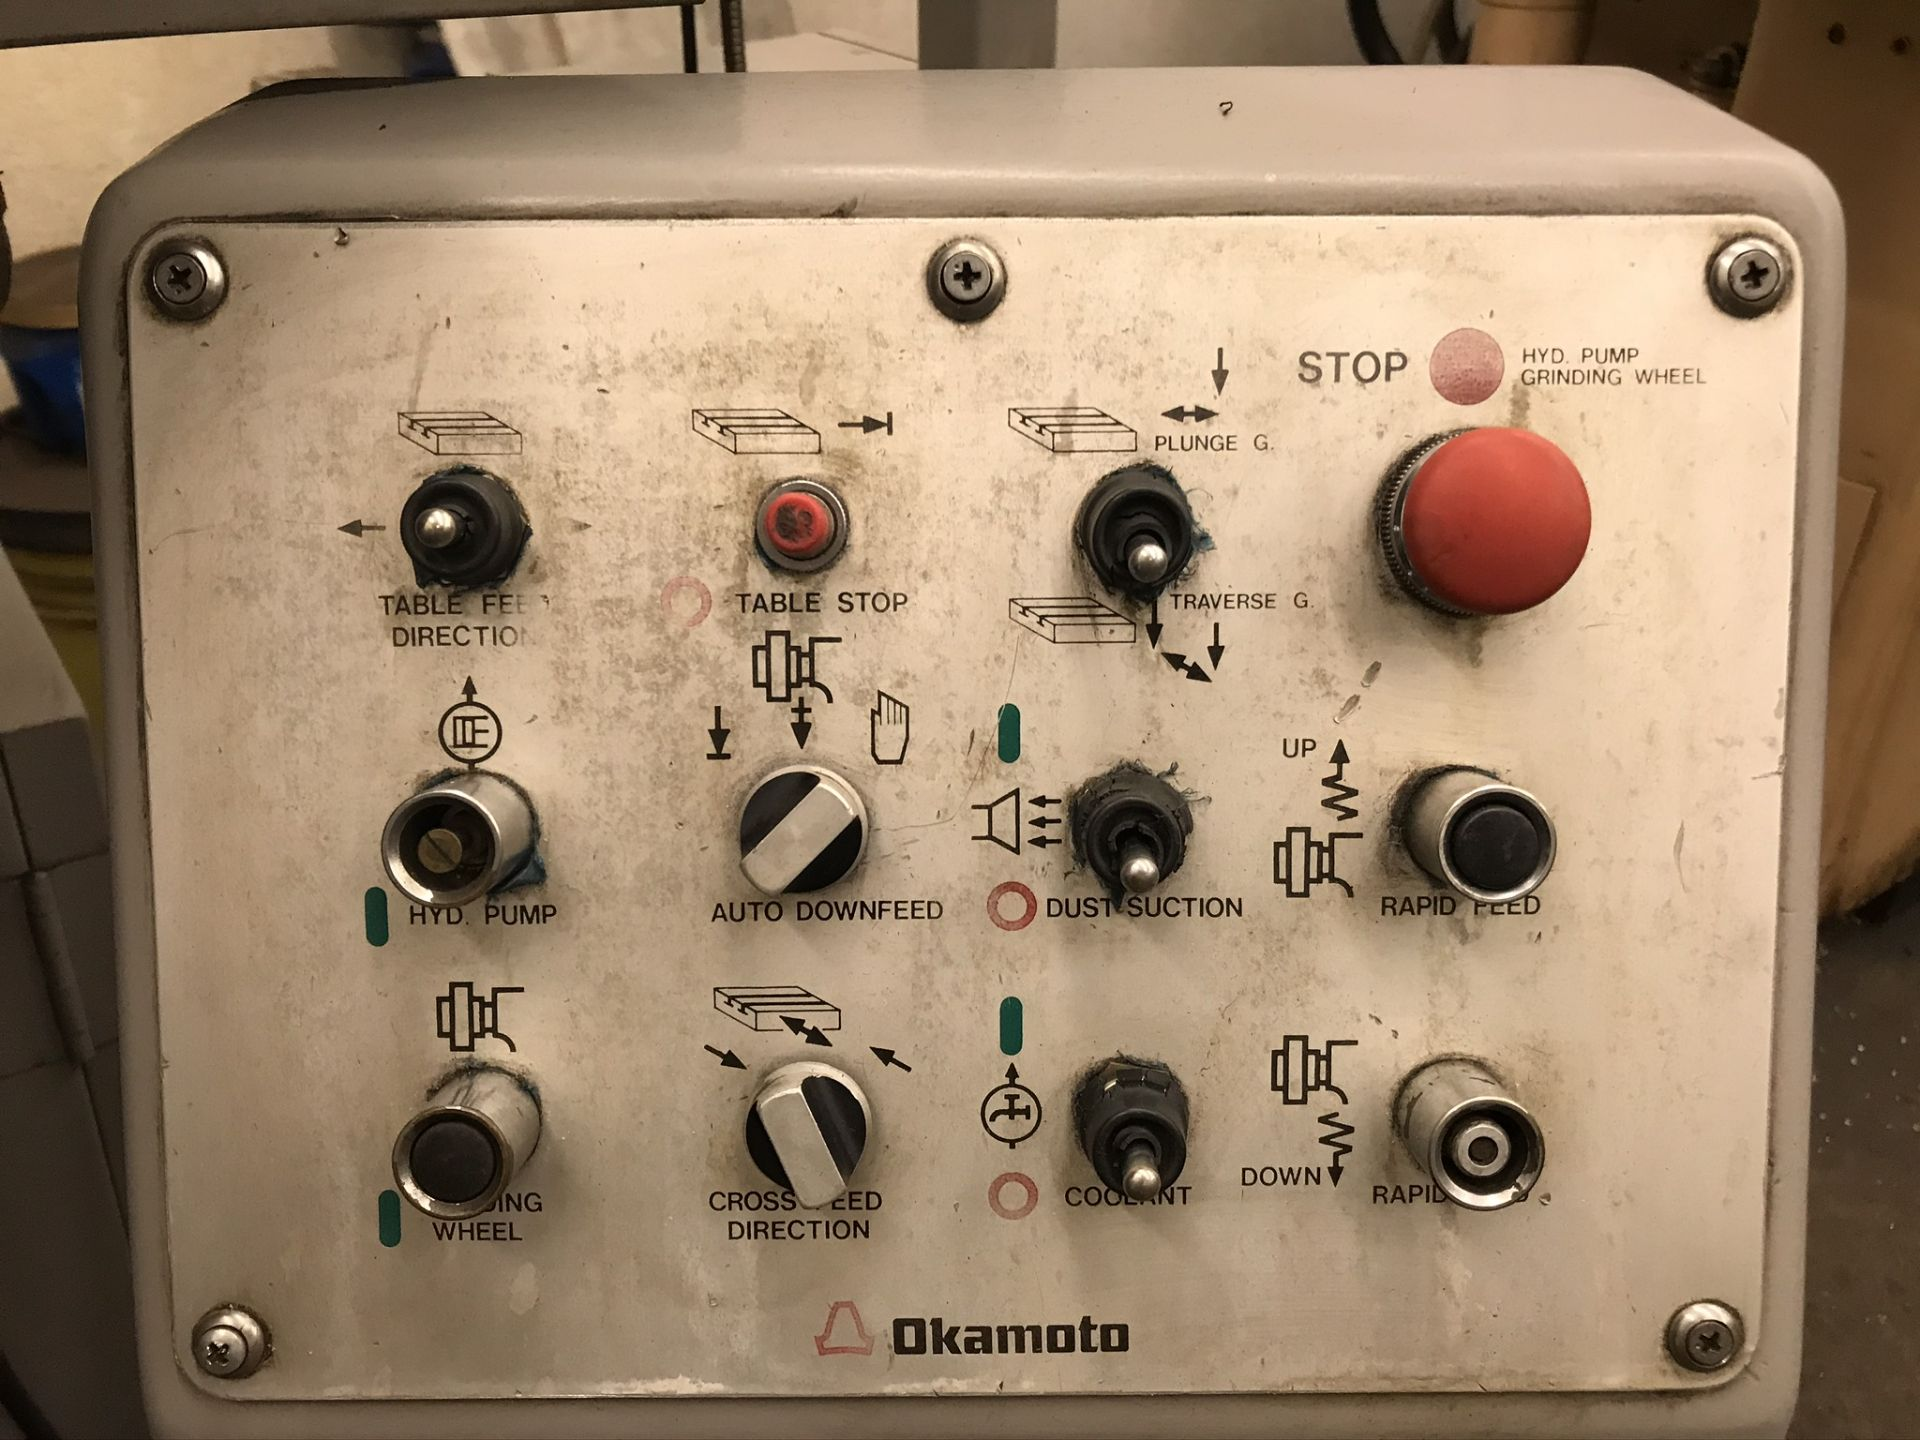 "Okamoto ACC-124N Hydraulic Surface Grinder 14"" Wheel w/ 12"" x 24"" Walker Electromagnetic Chuck - Image 6 of 14"